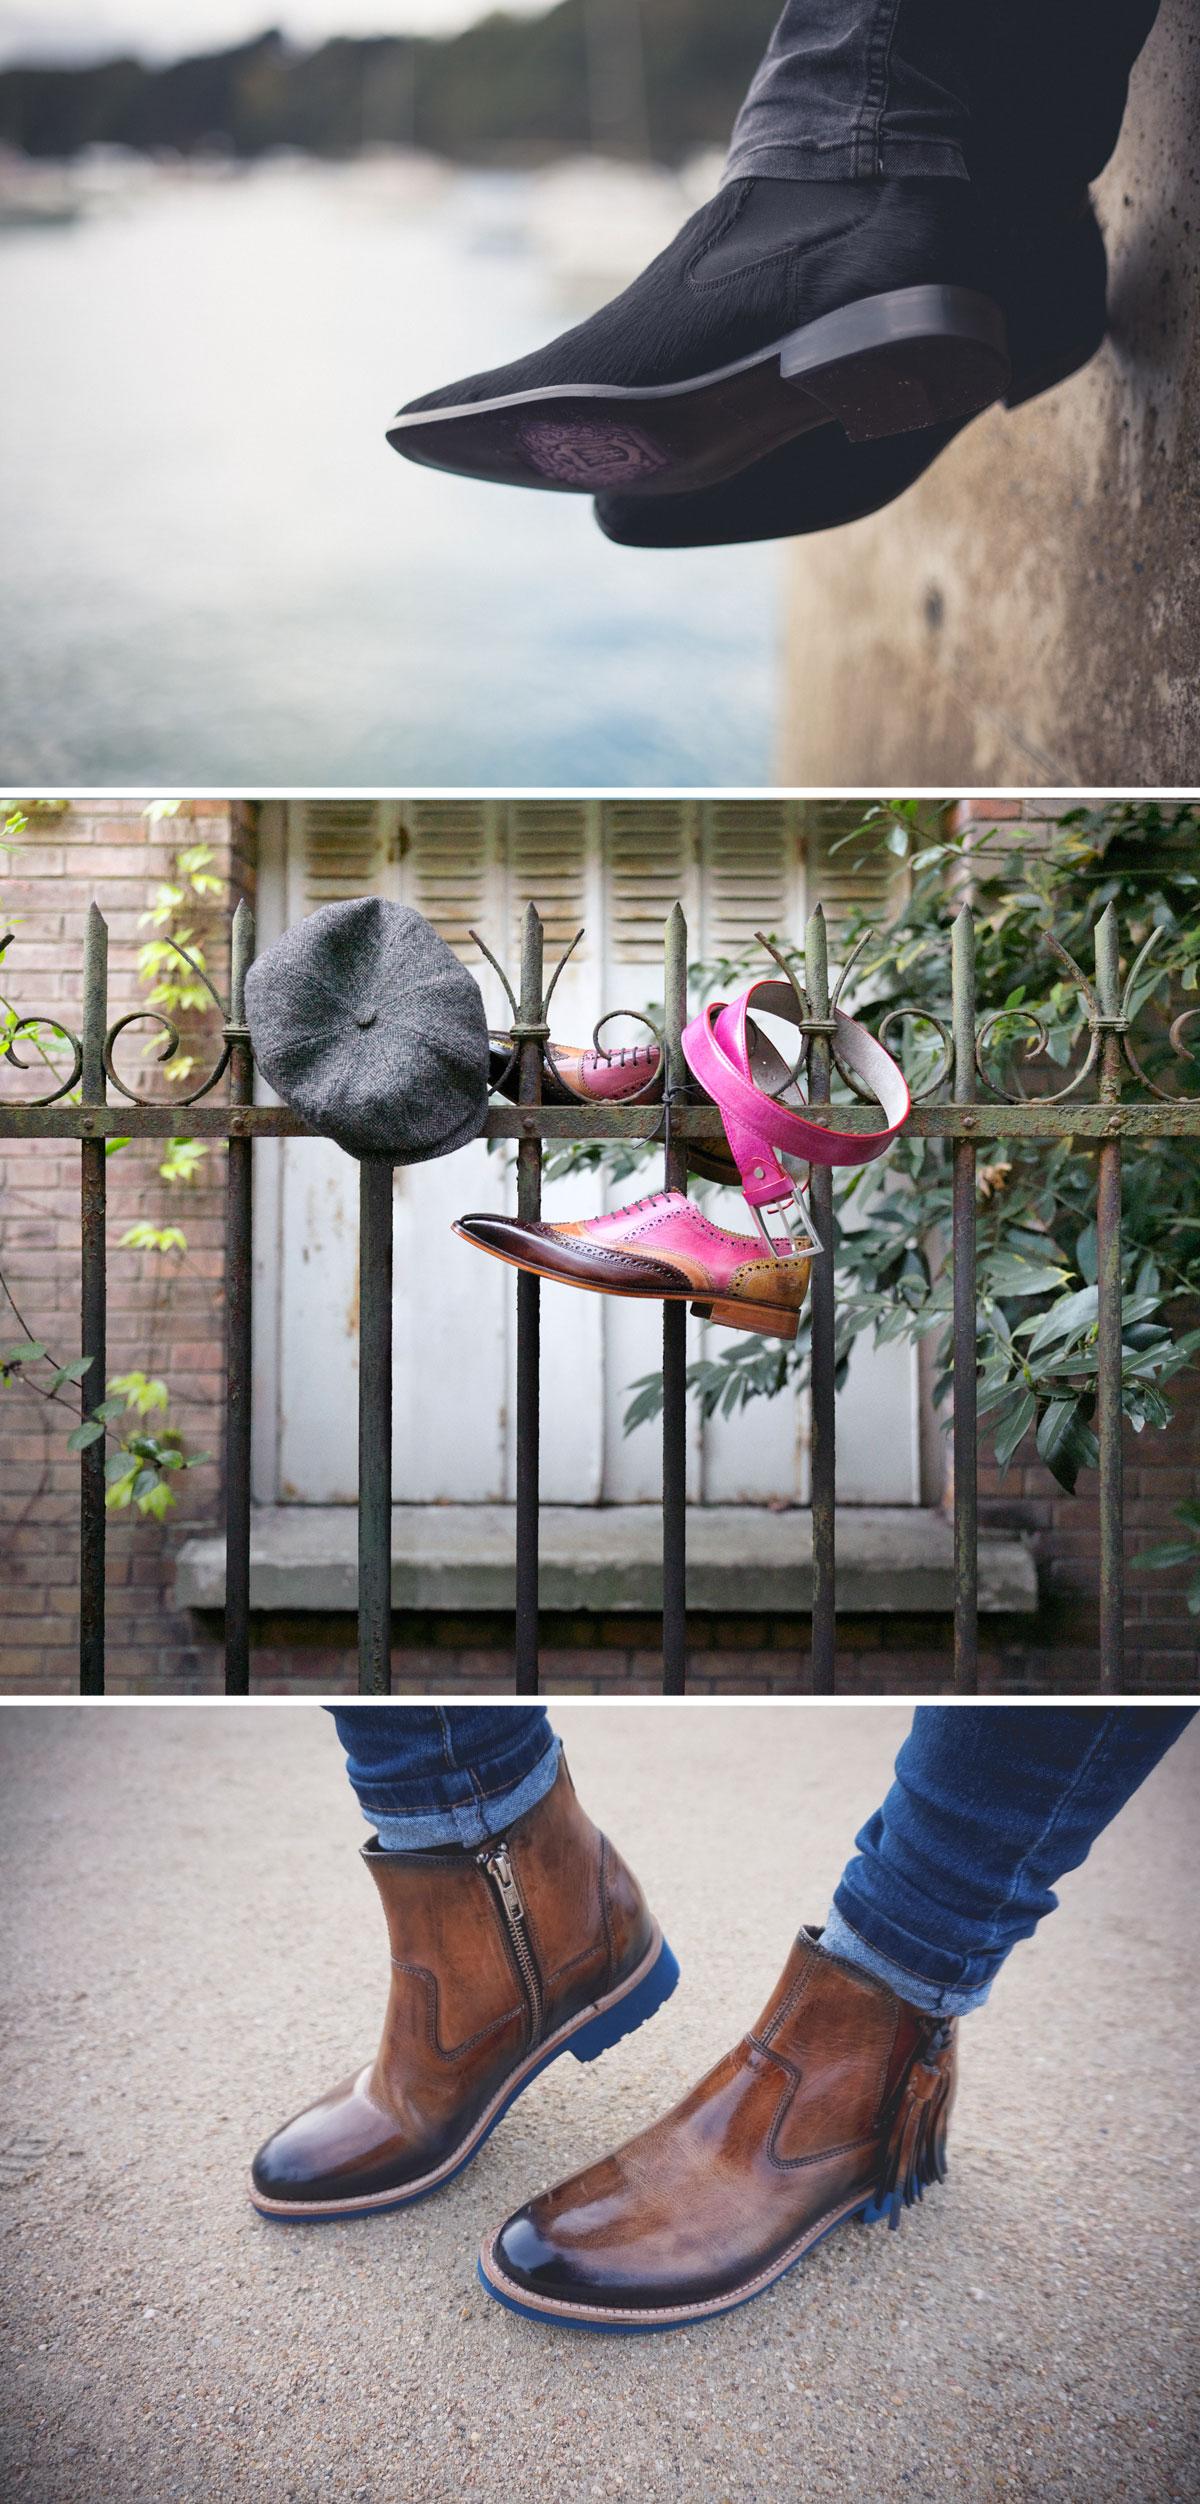 Melvin & Hamilton schoenen